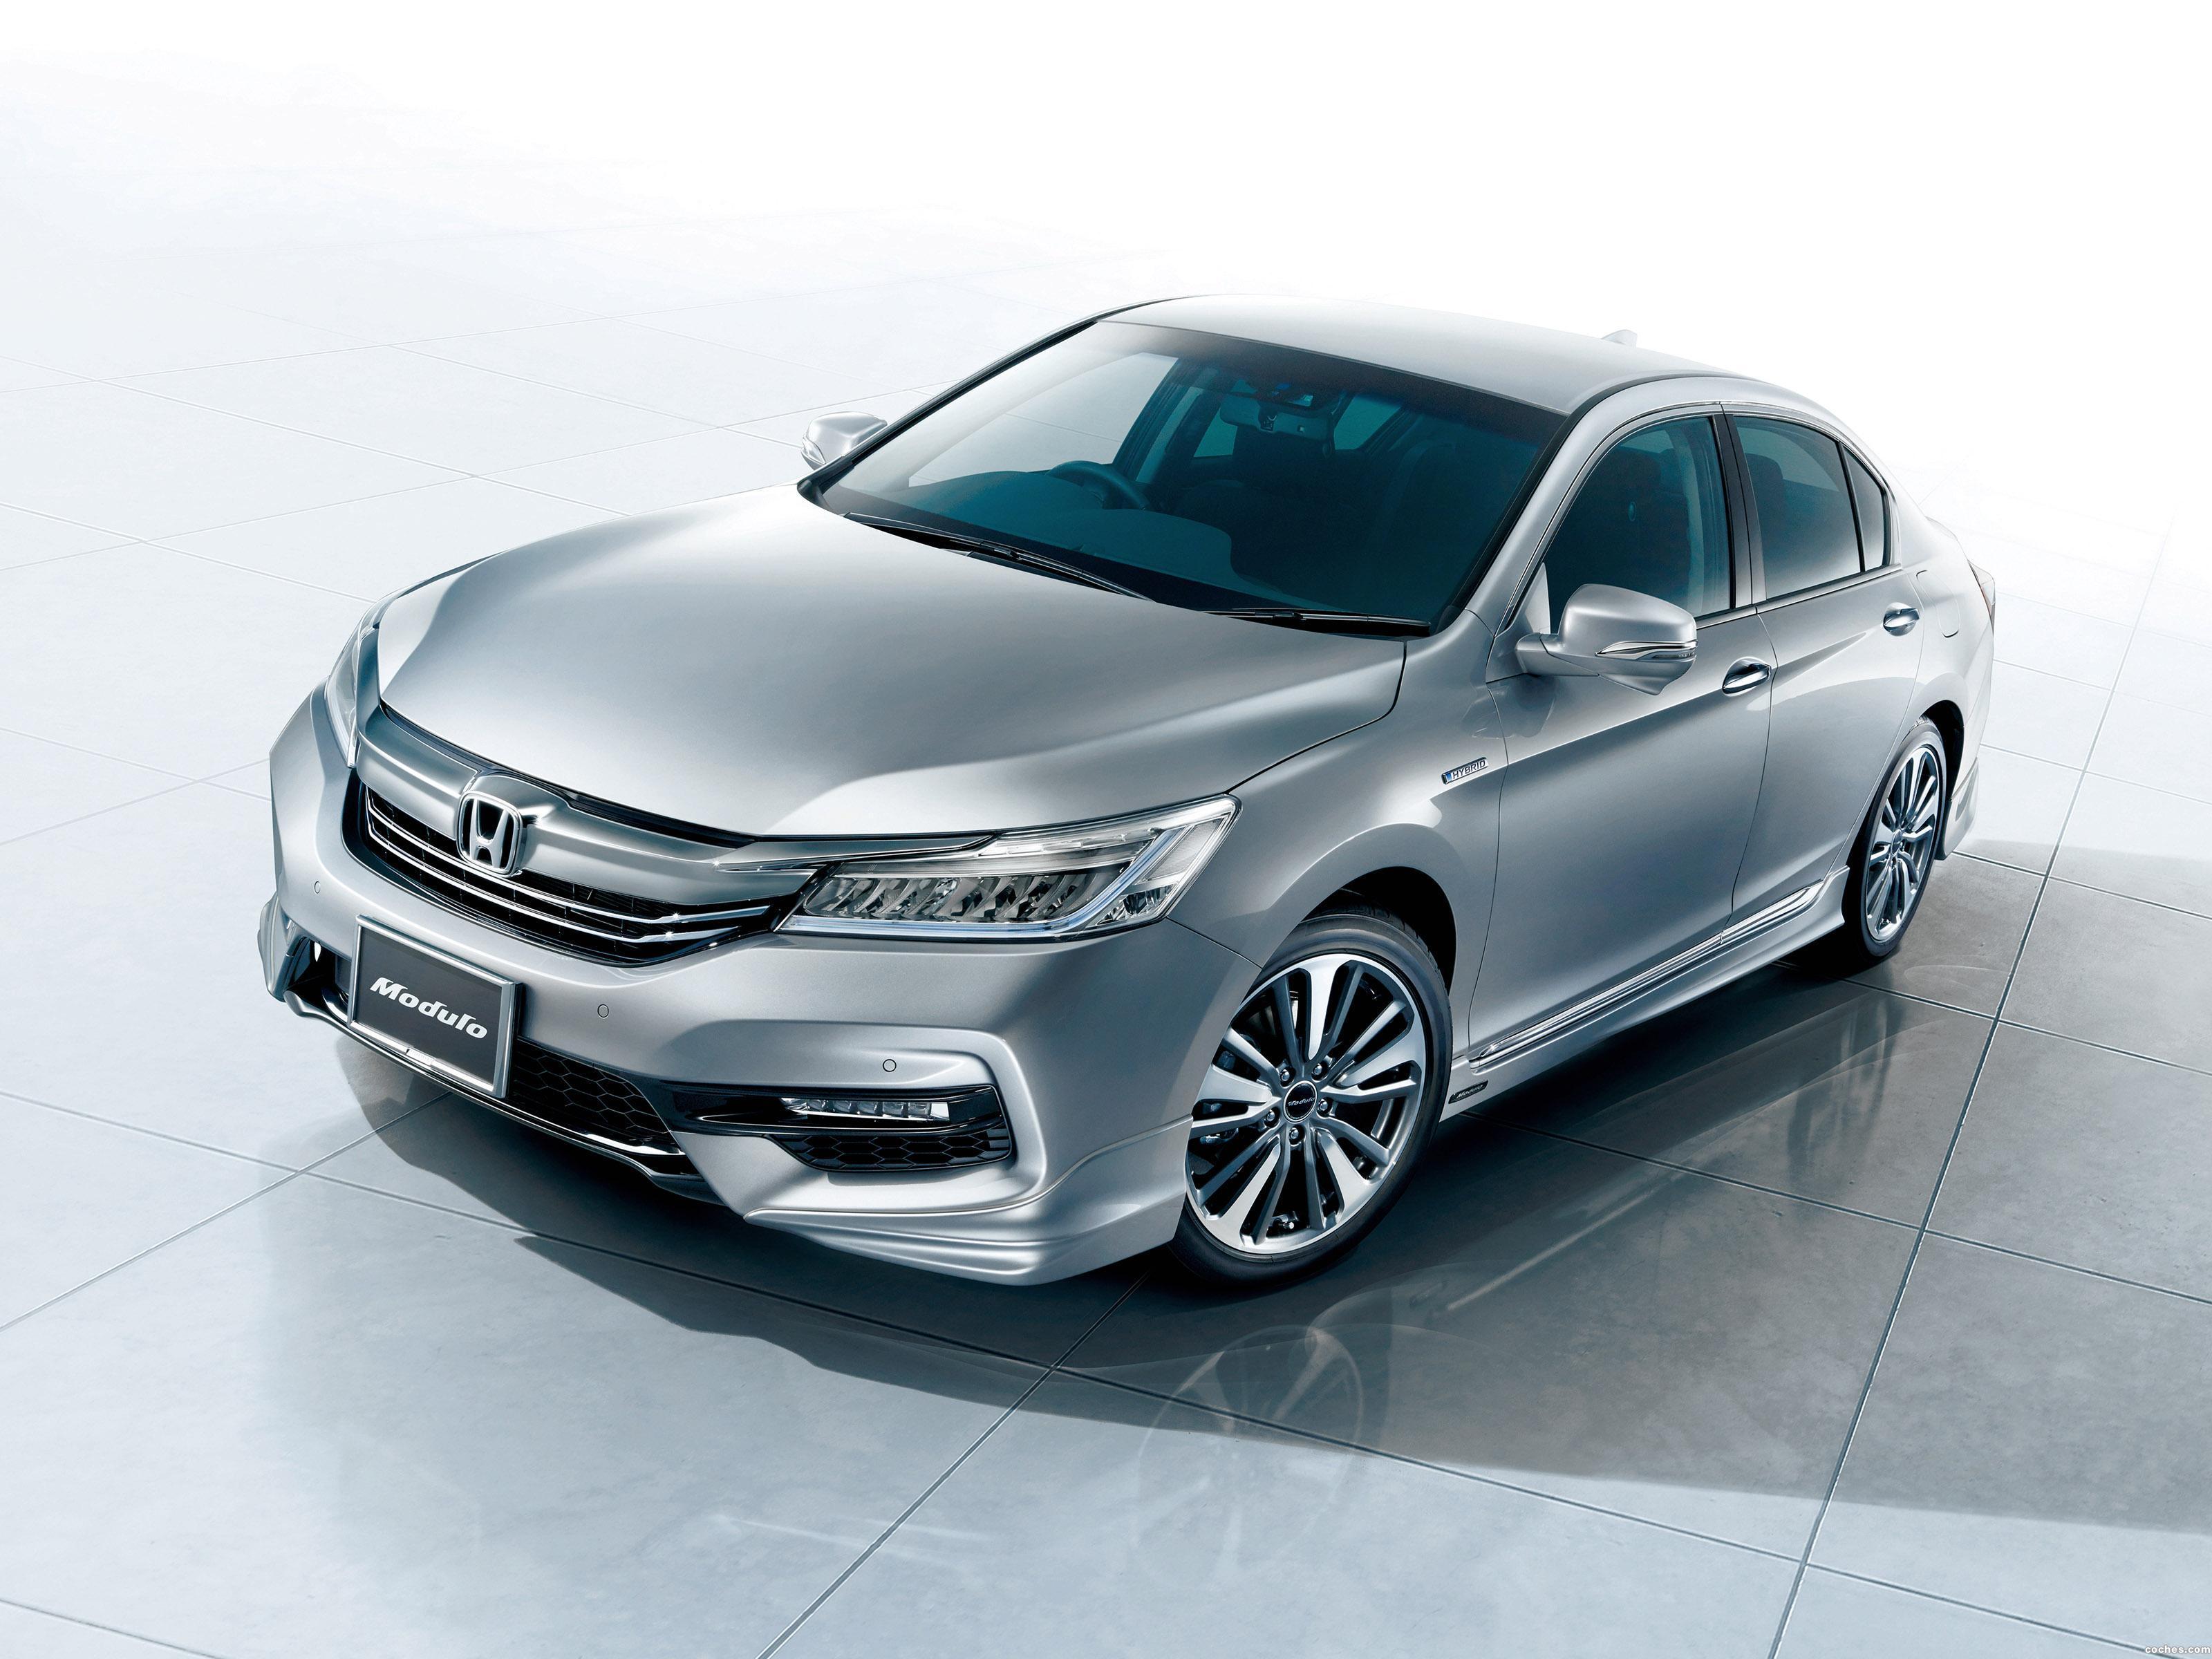 modulo_honda-accord-hybrid-japan-2016_r8.jpg